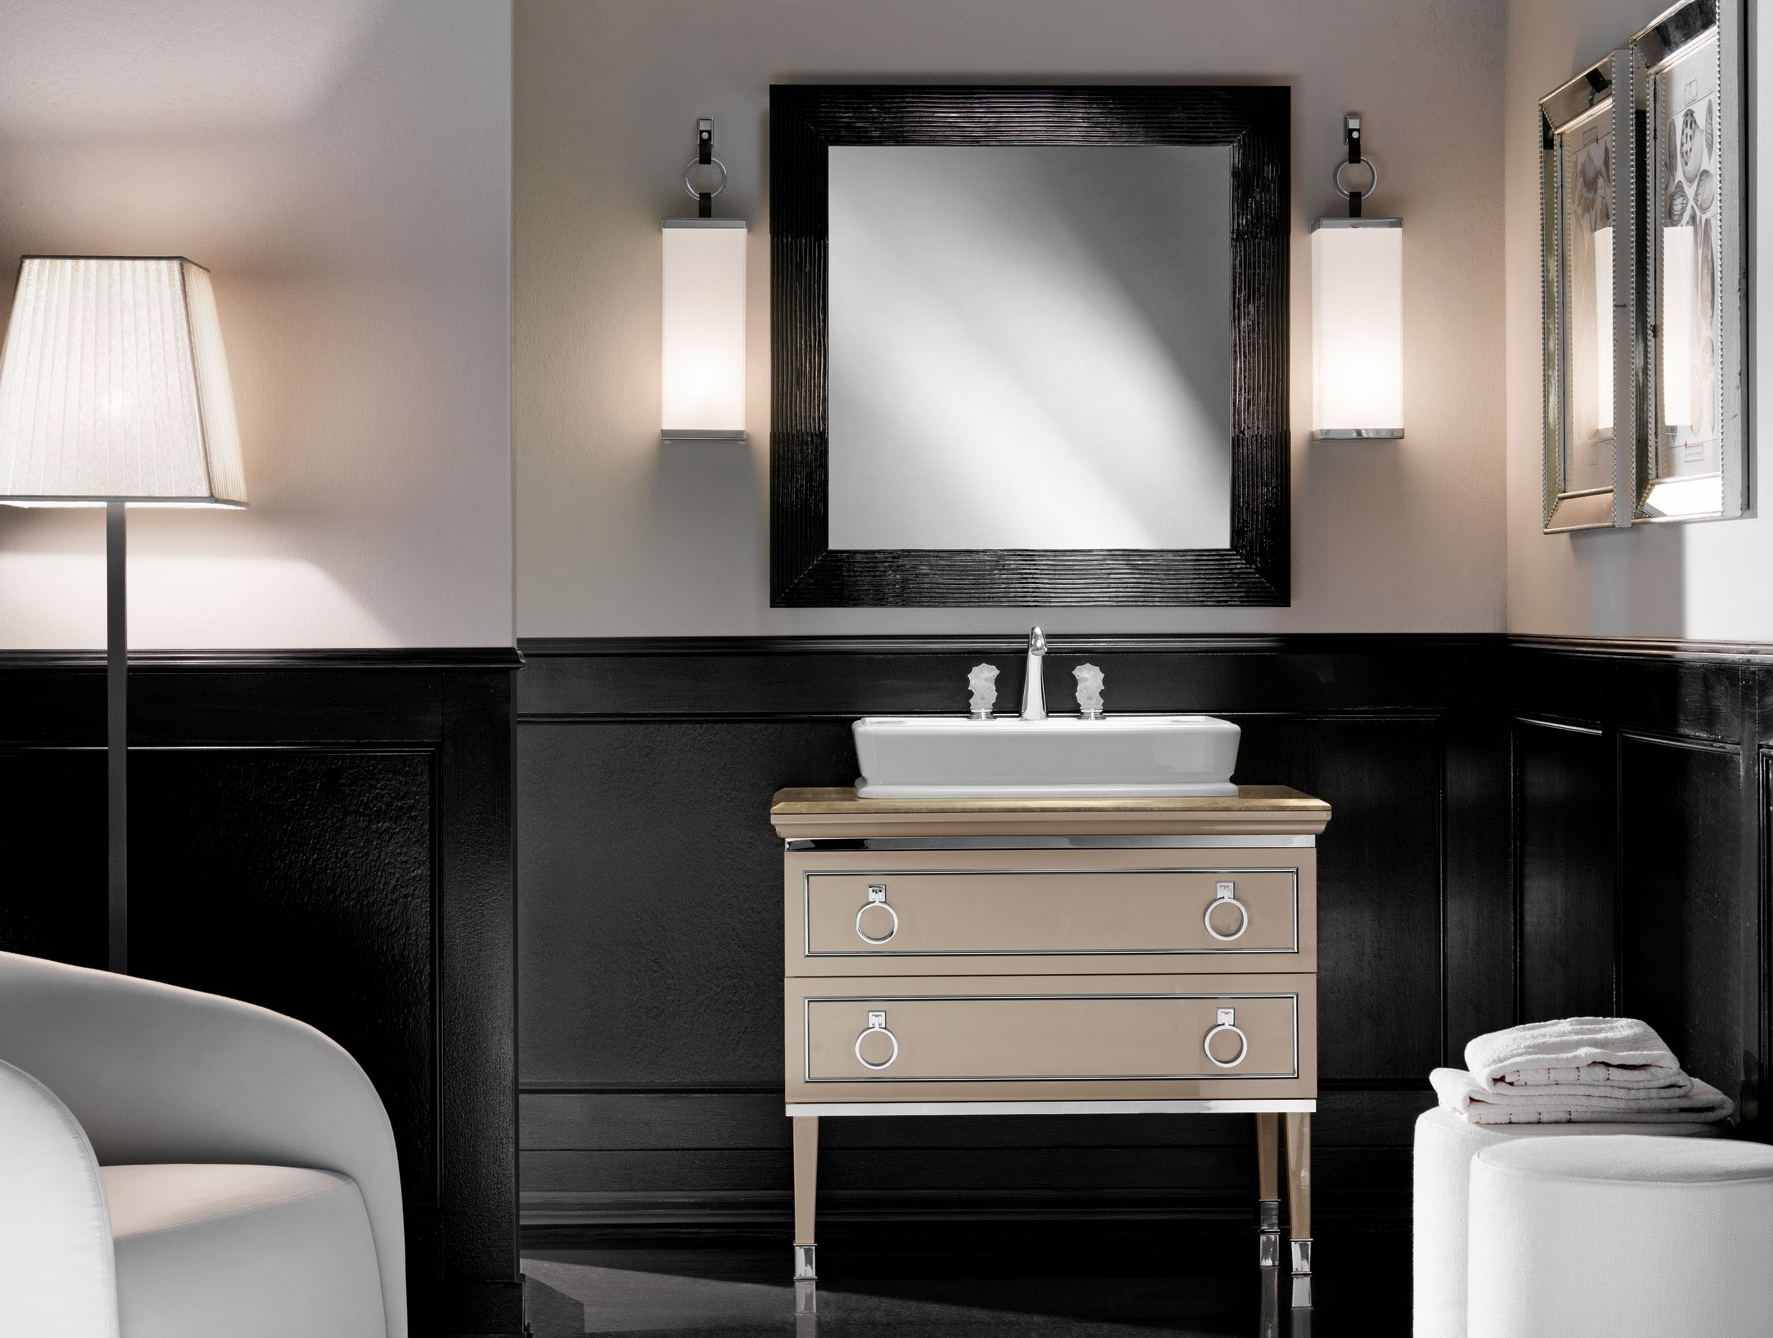 Lutetia L12 Traditional Italian Art Deco Bathroom Vanity Beige Lacquer Regarding Favorite Italian Wall Art For Bathroom (View 6 of 15)